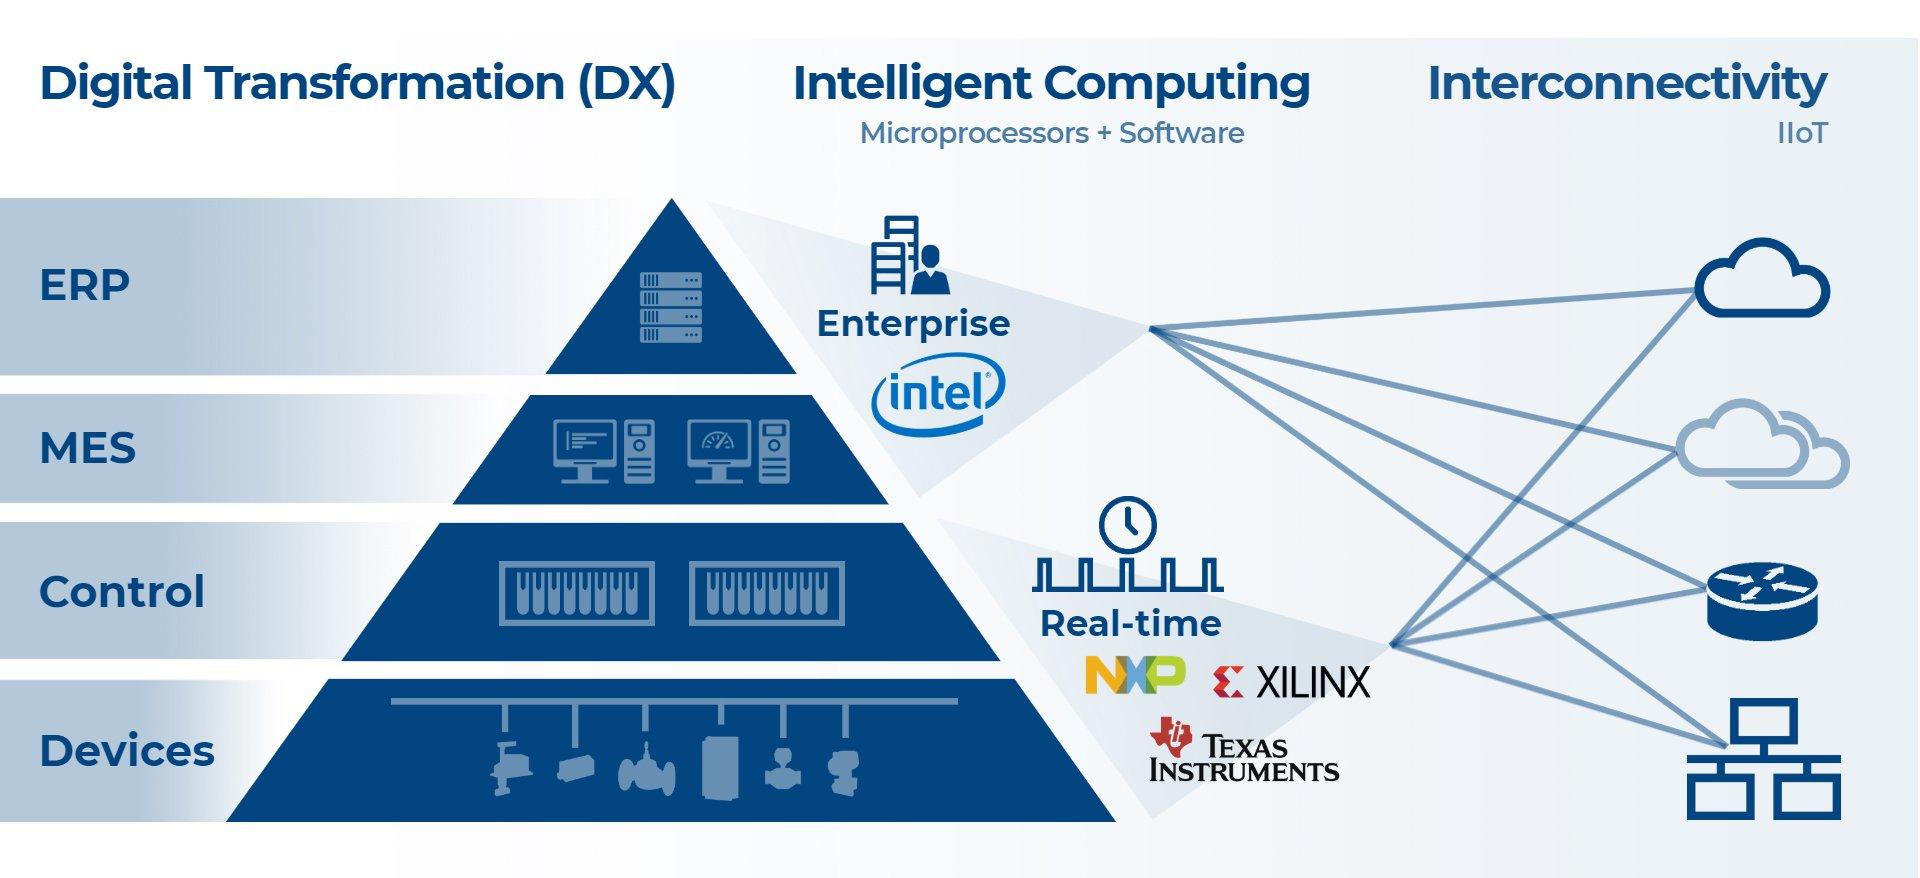 Digital Transformation - Intelligent Computing - Interconnectivity